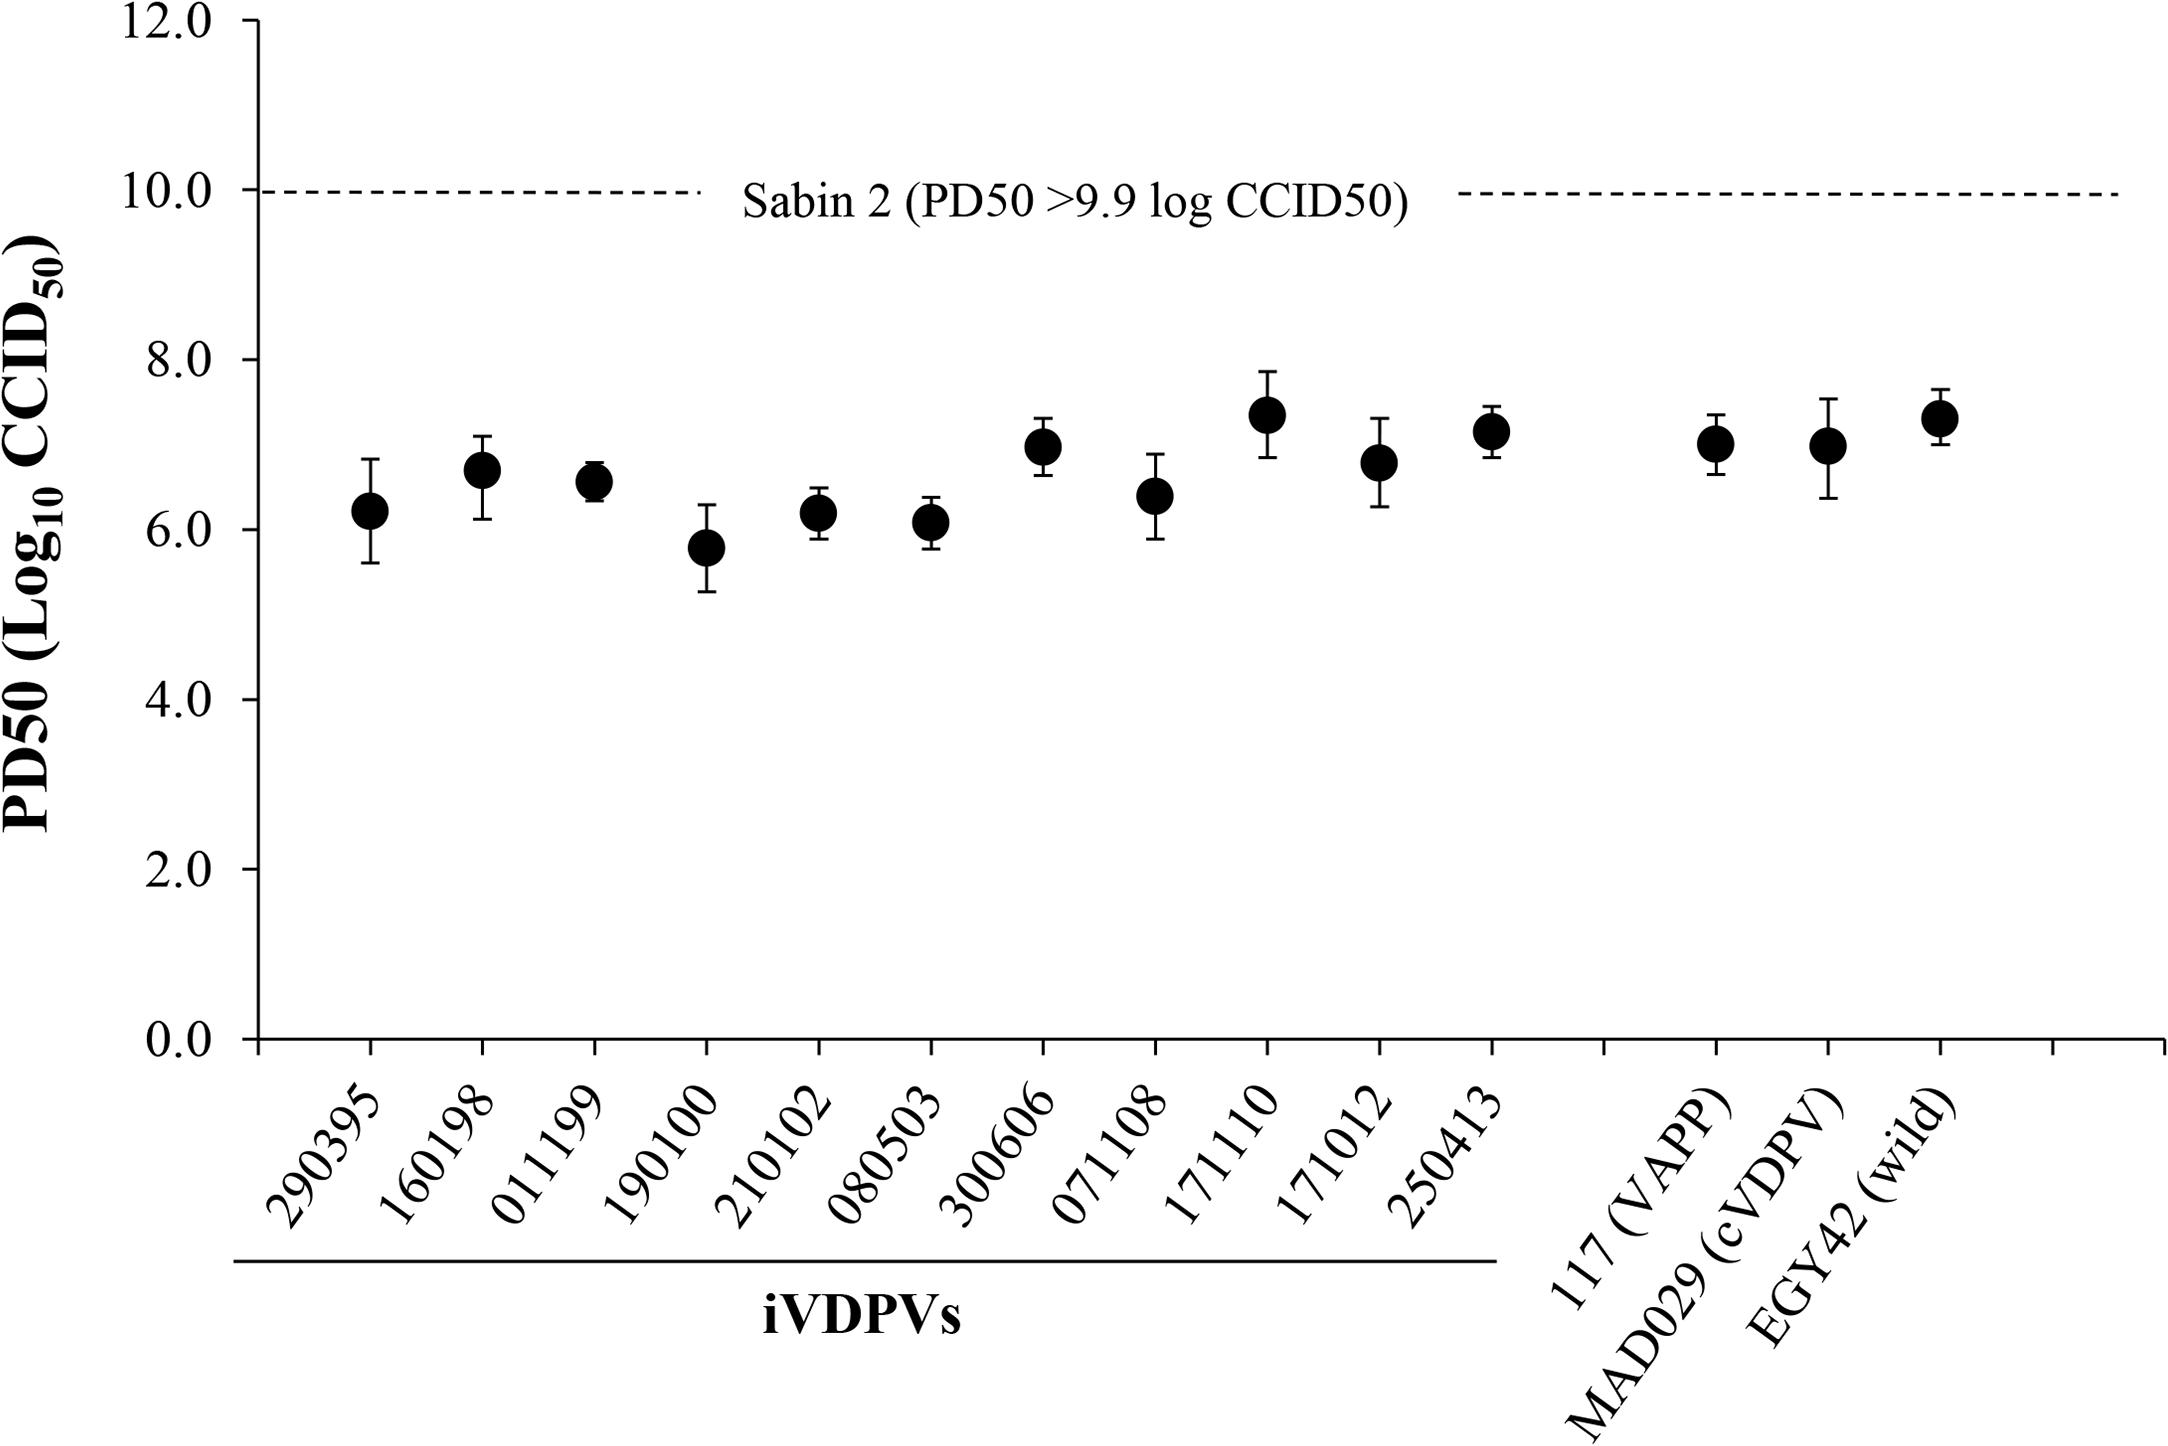 Neurovirulence of iVDPV strains.